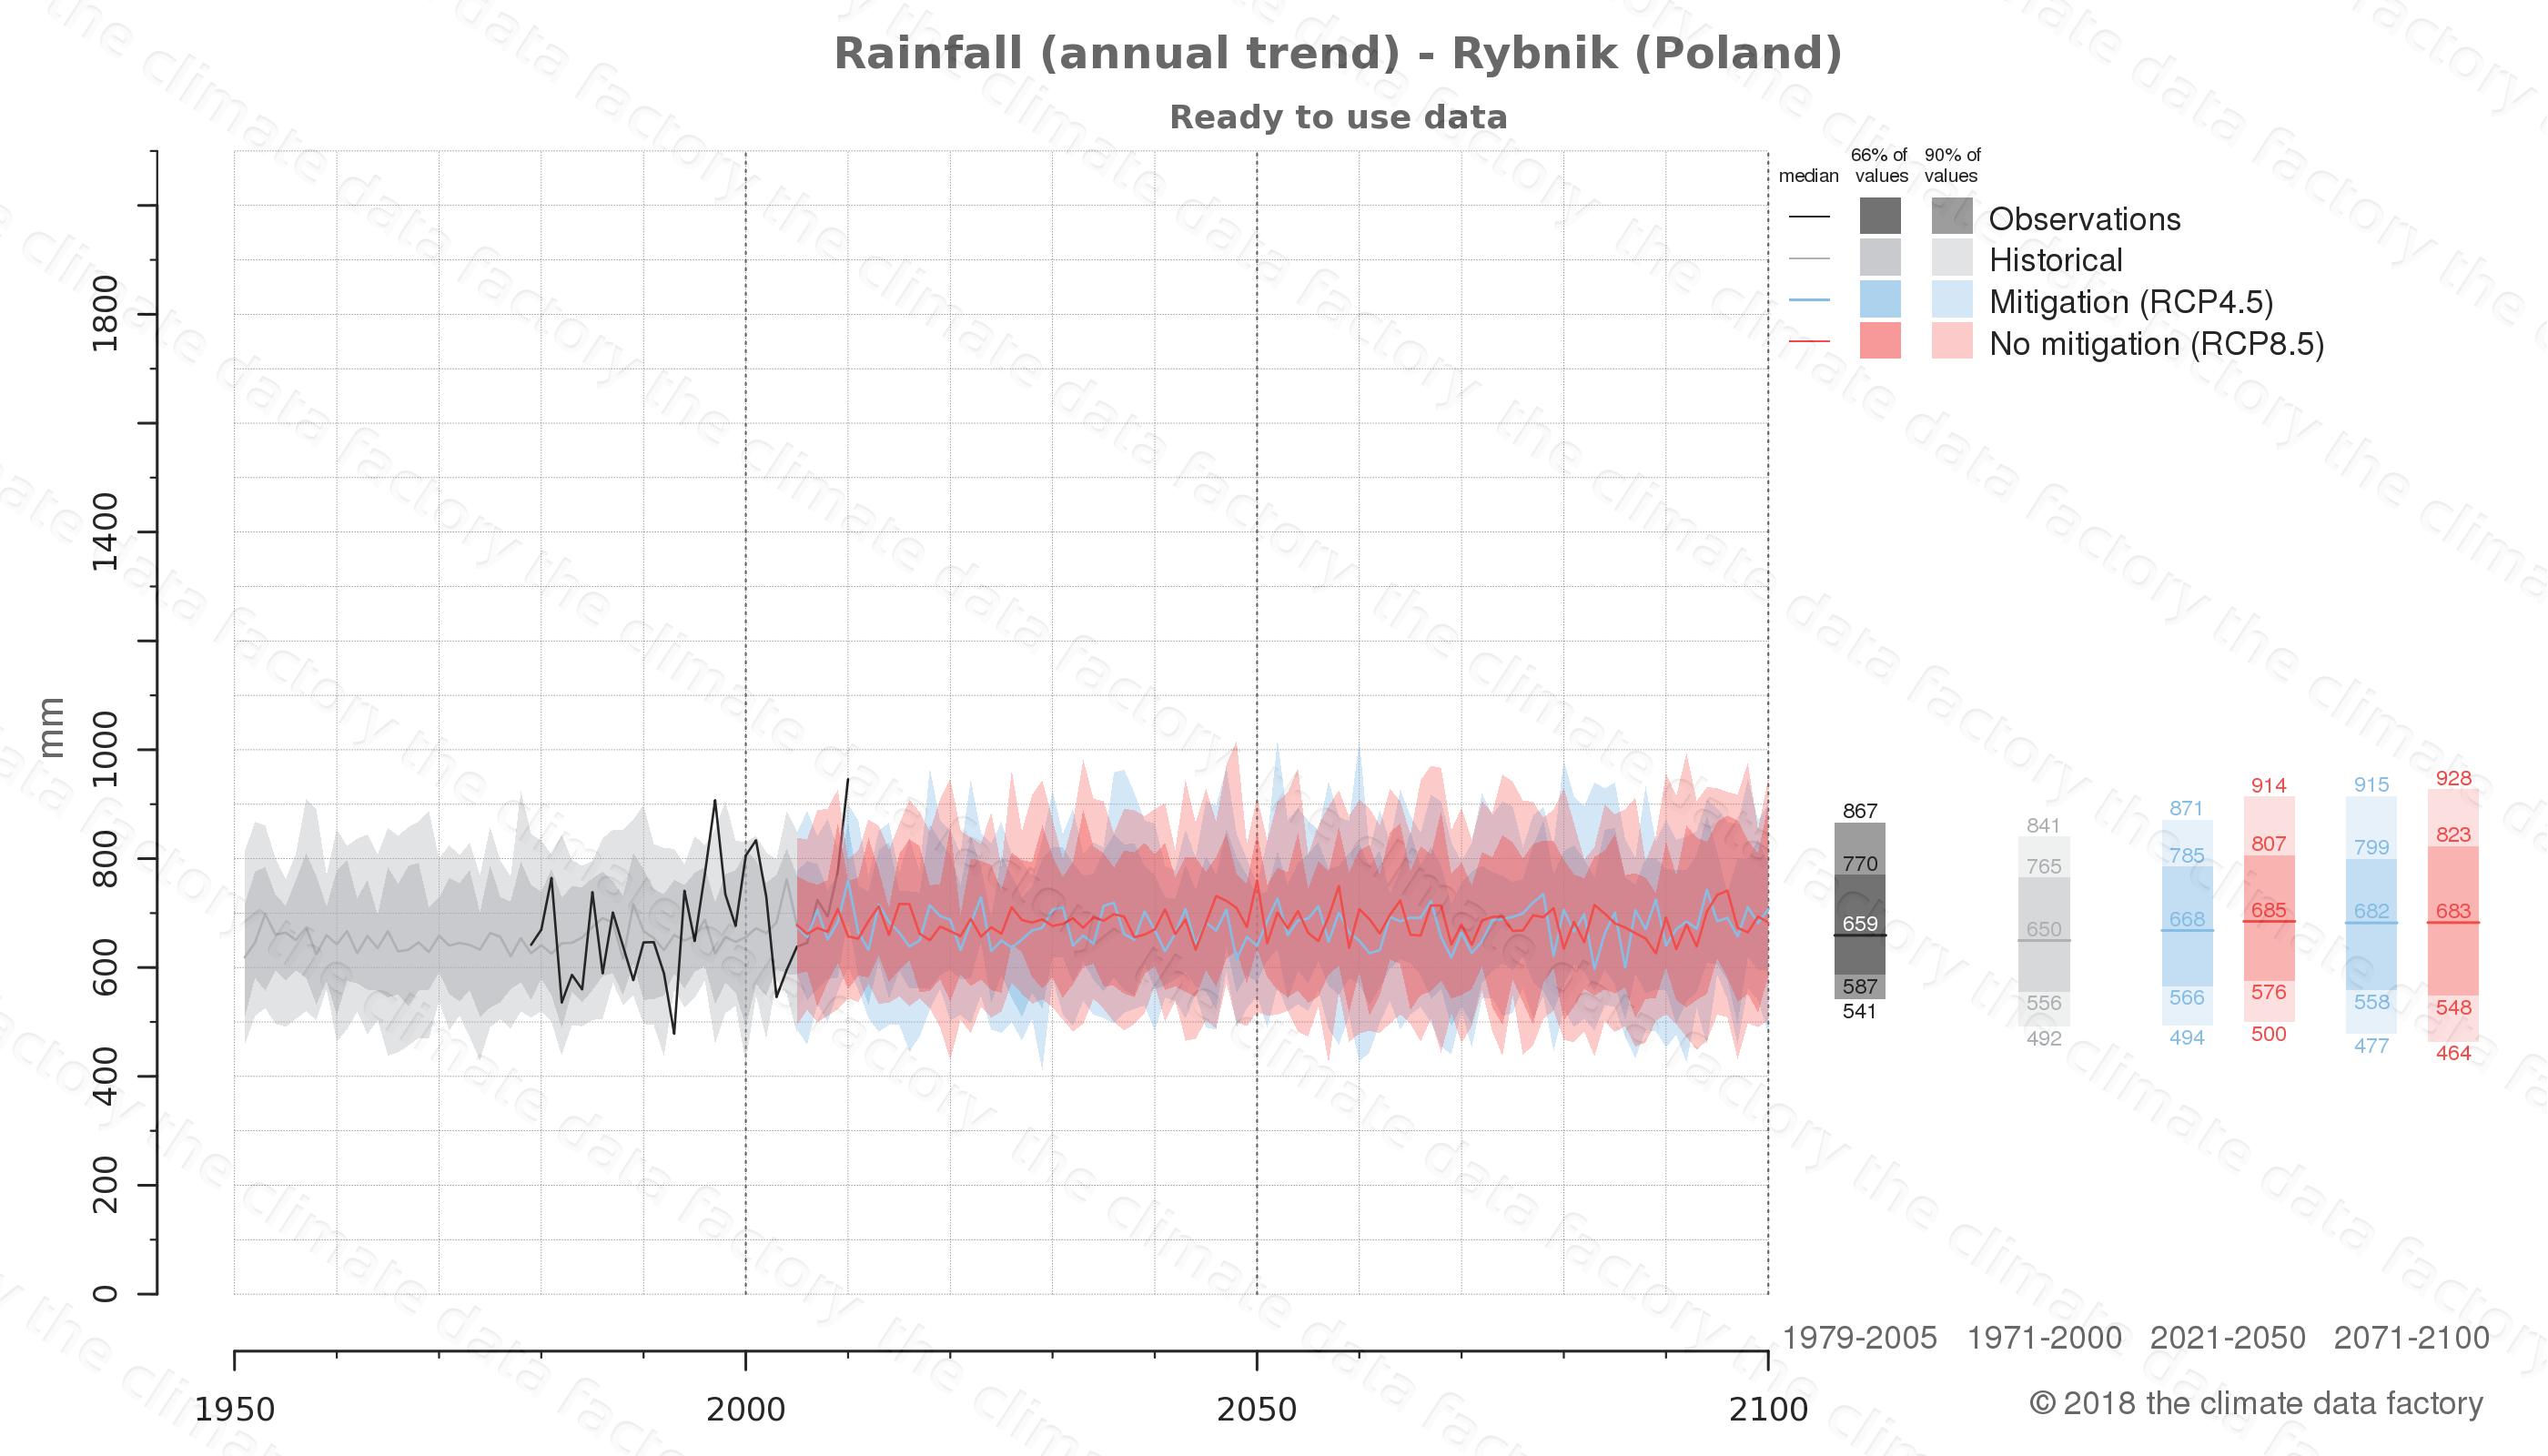 climate change data policy adaptation climate graph city data rainfall rybnik poland